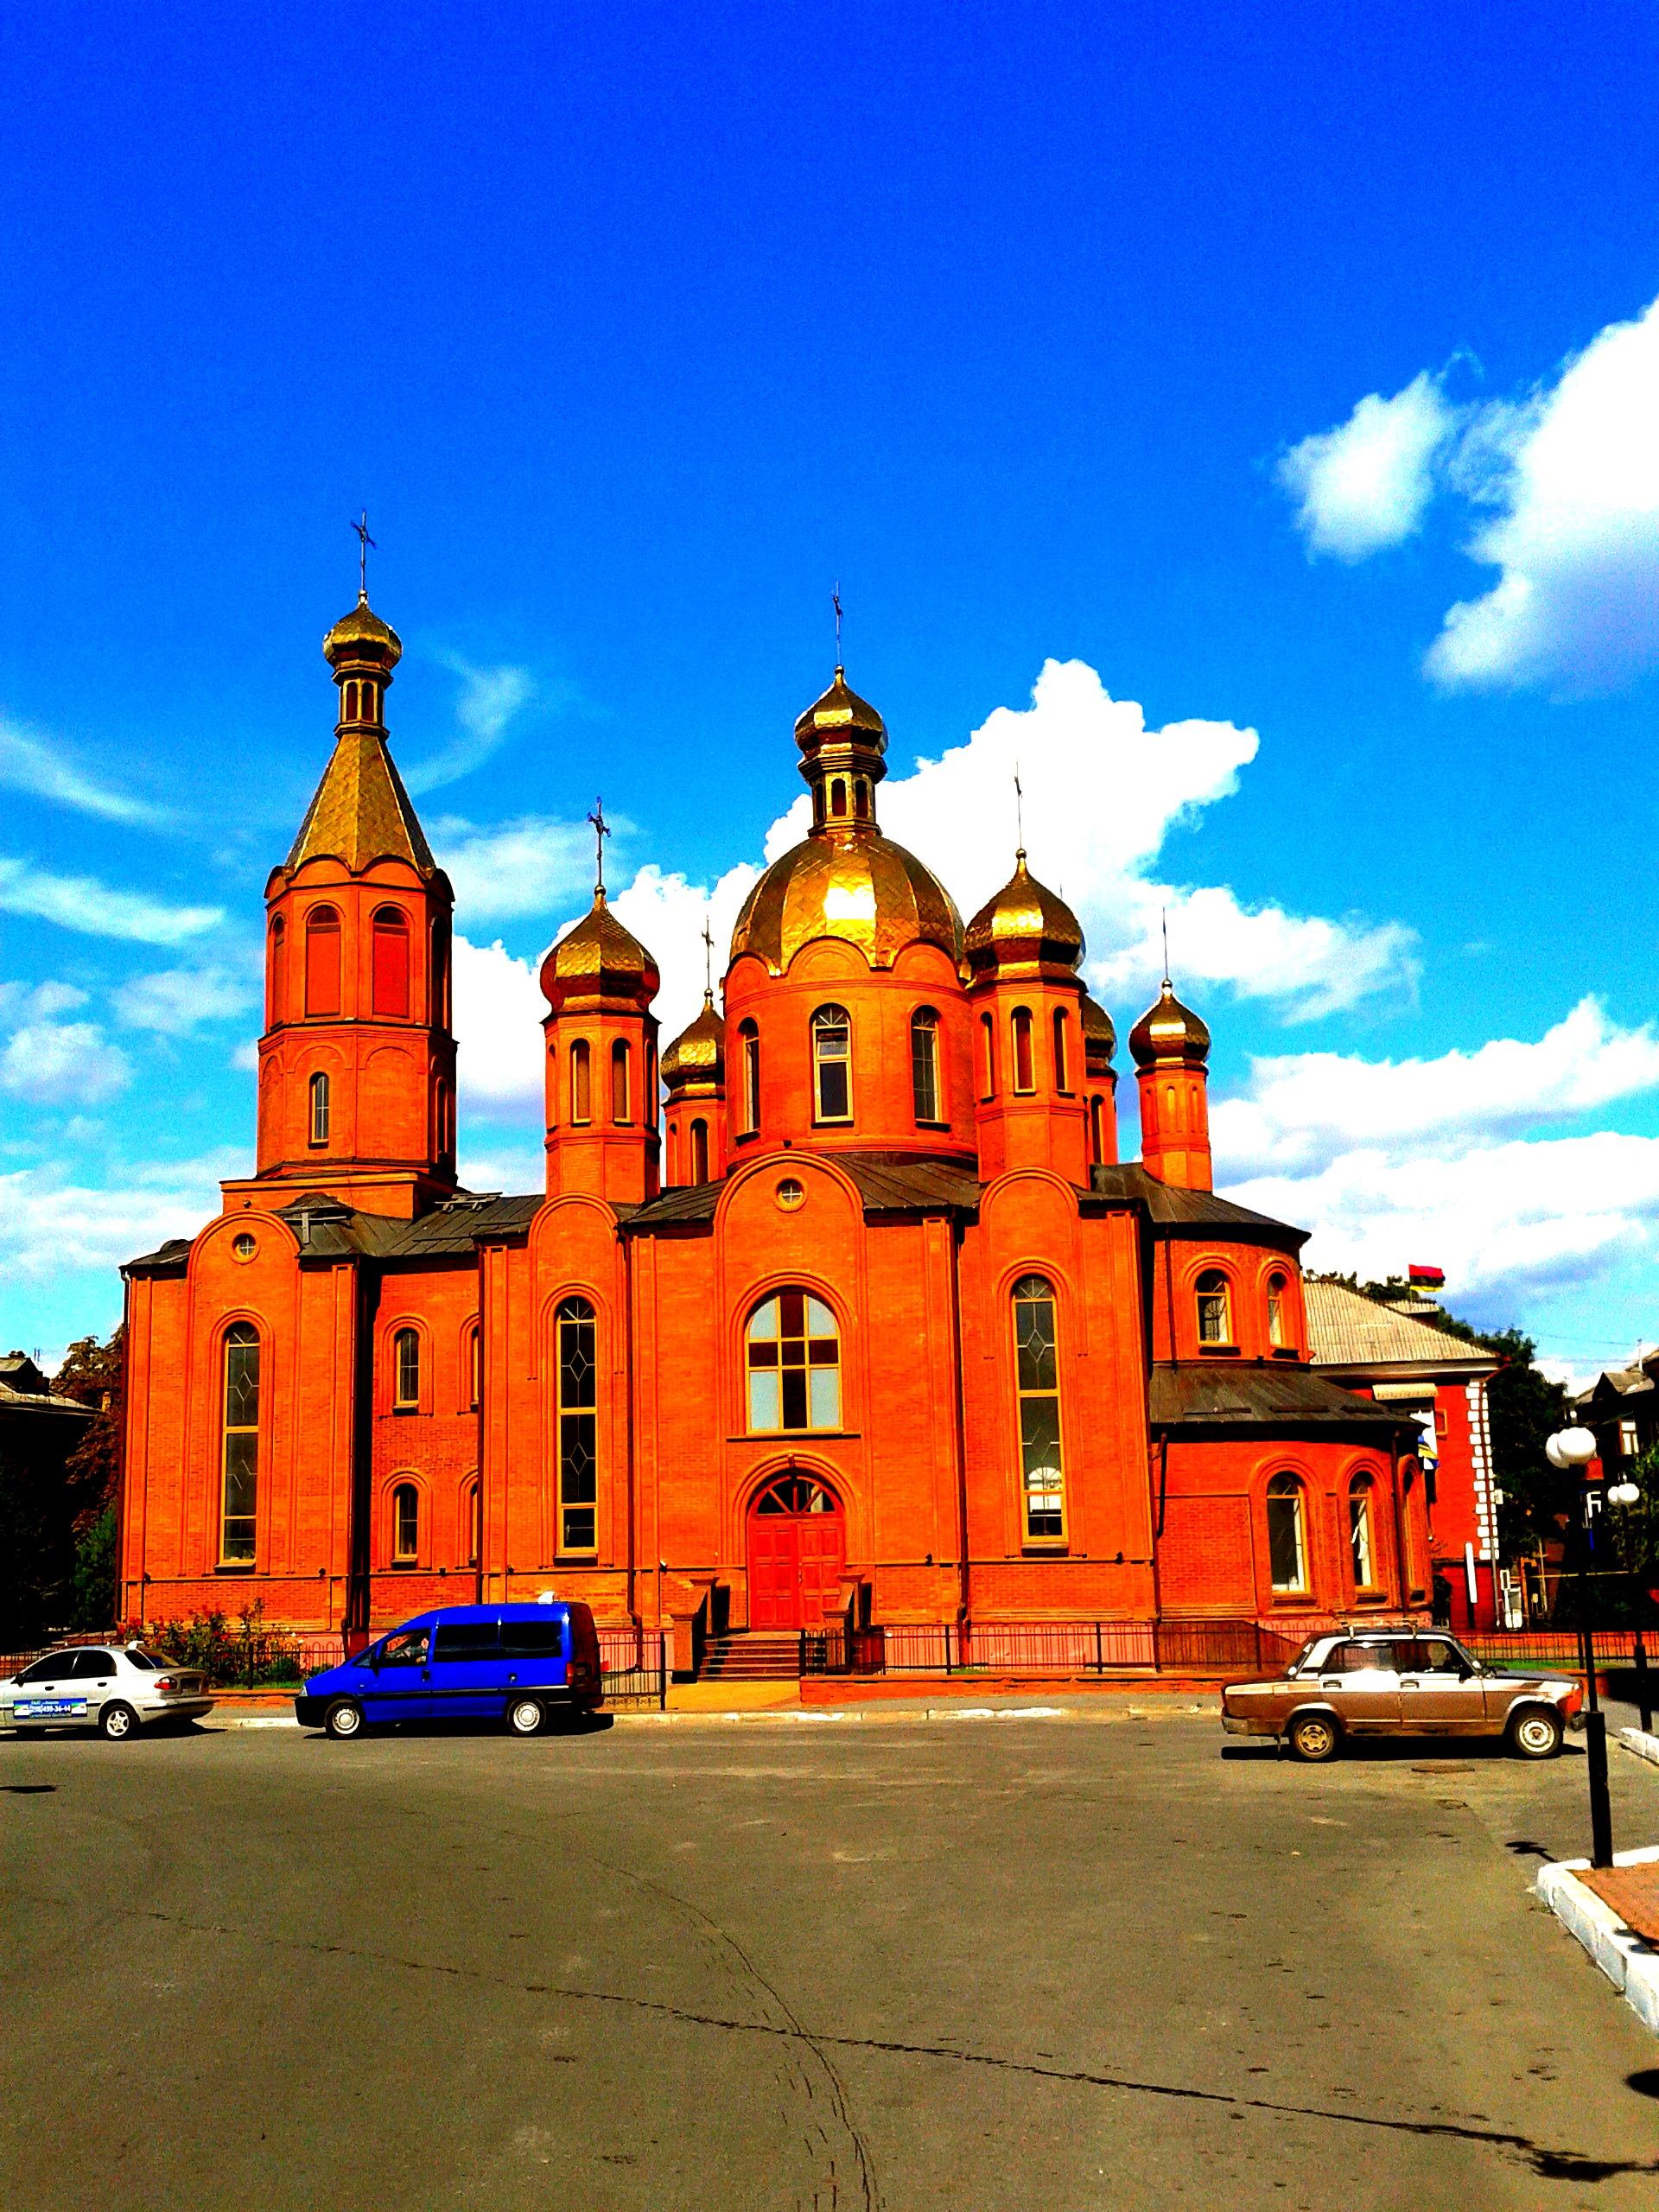 Dentistry Vinnytsia region: a selection of sites